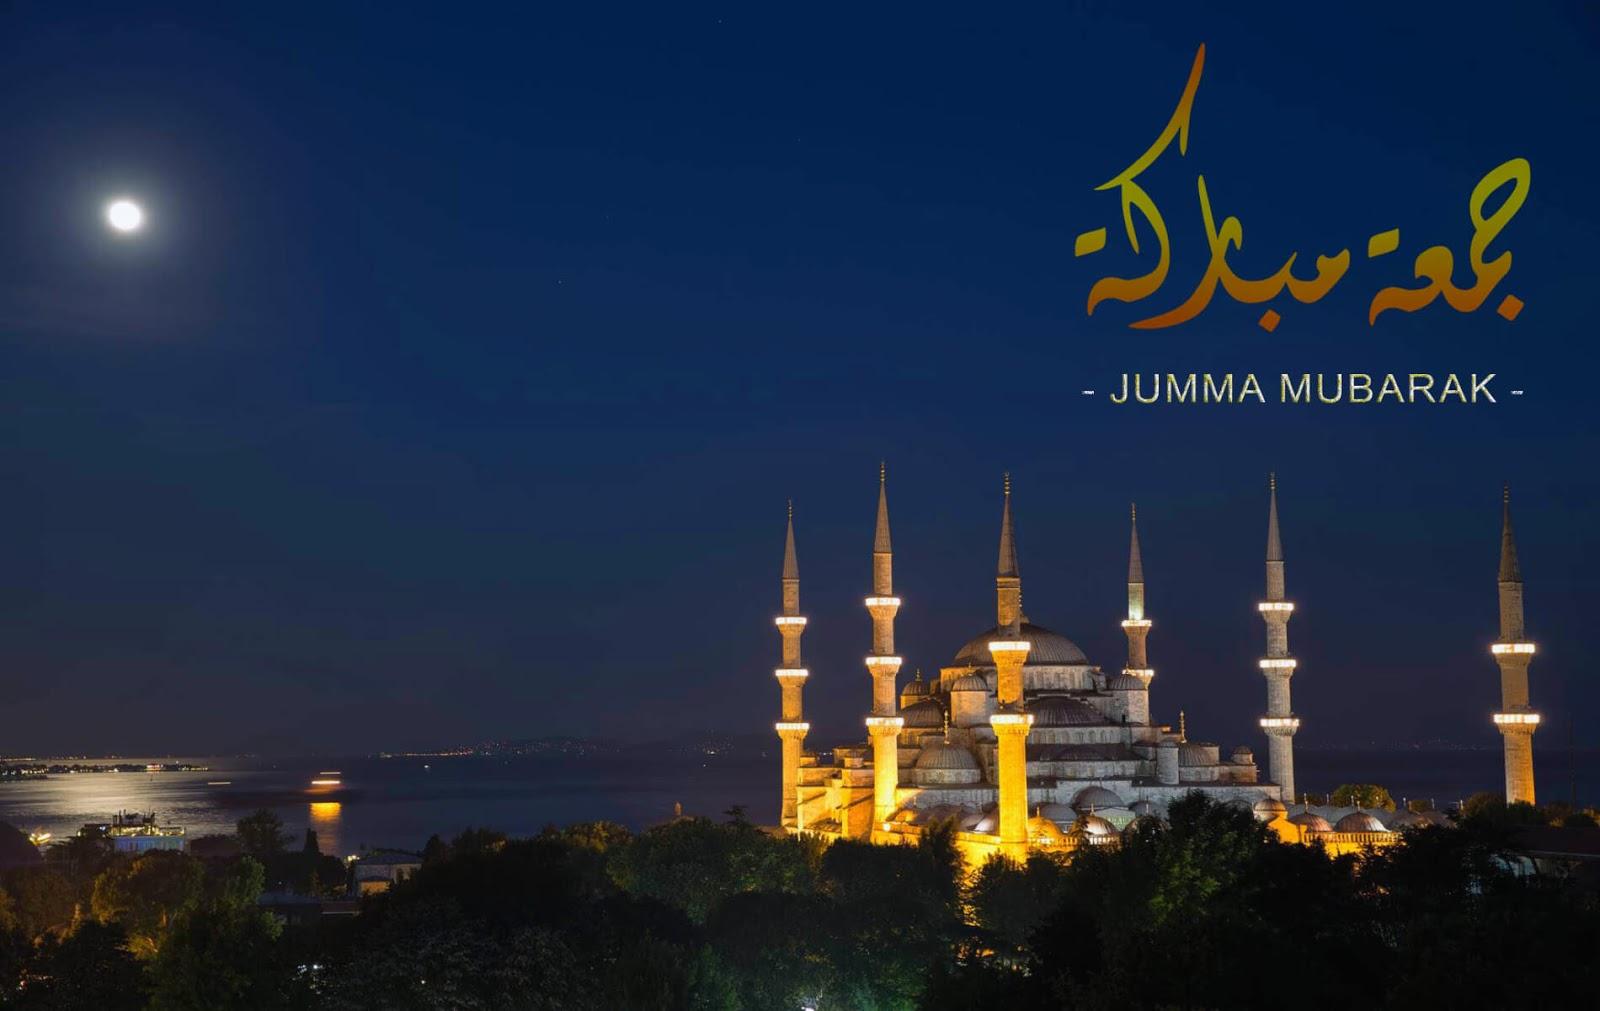 Jumma Mubarak Image for Facebook